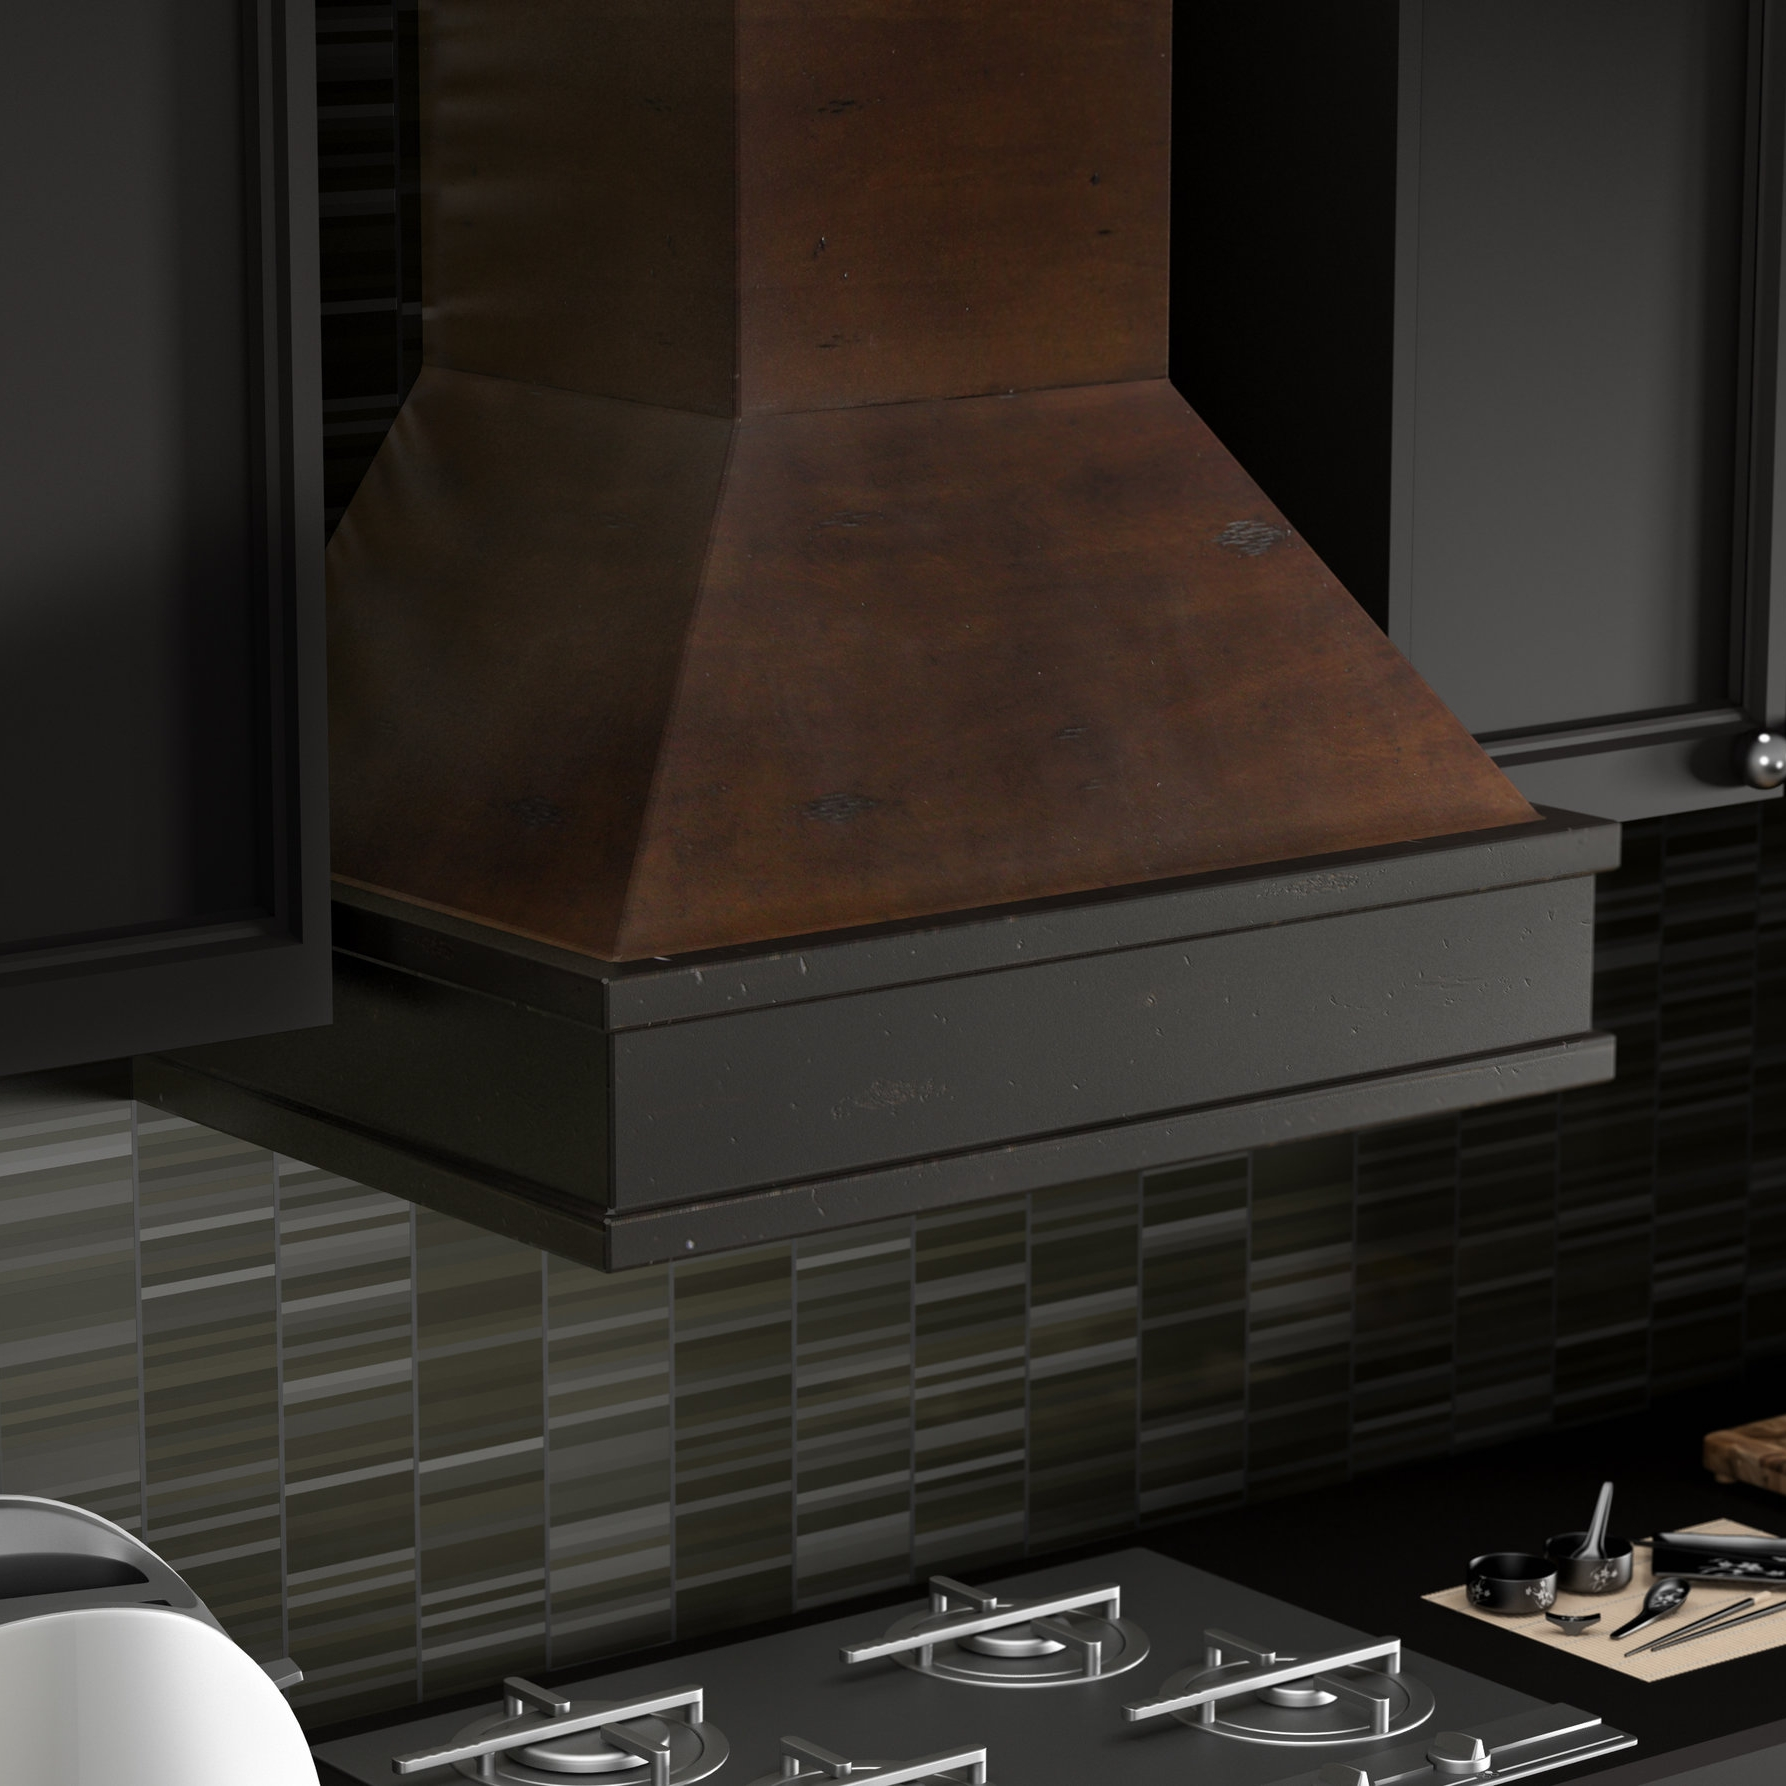 custom-wood-range-hood-zline-329AH-kitchen-close.jpg